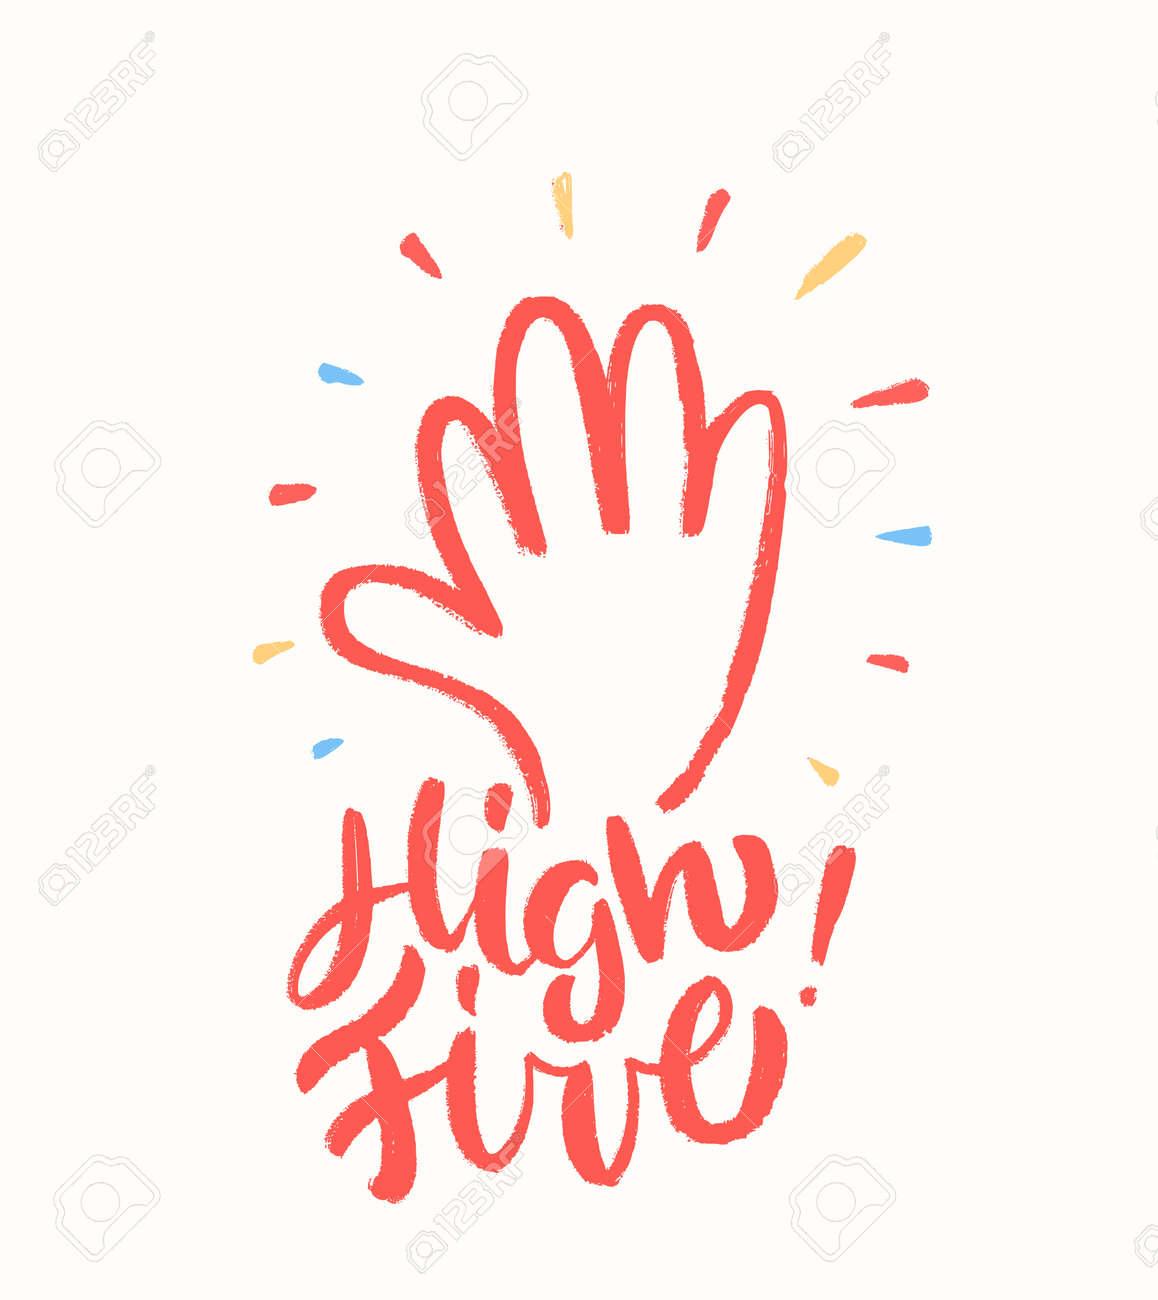 High five. Greeting card. - 158142985